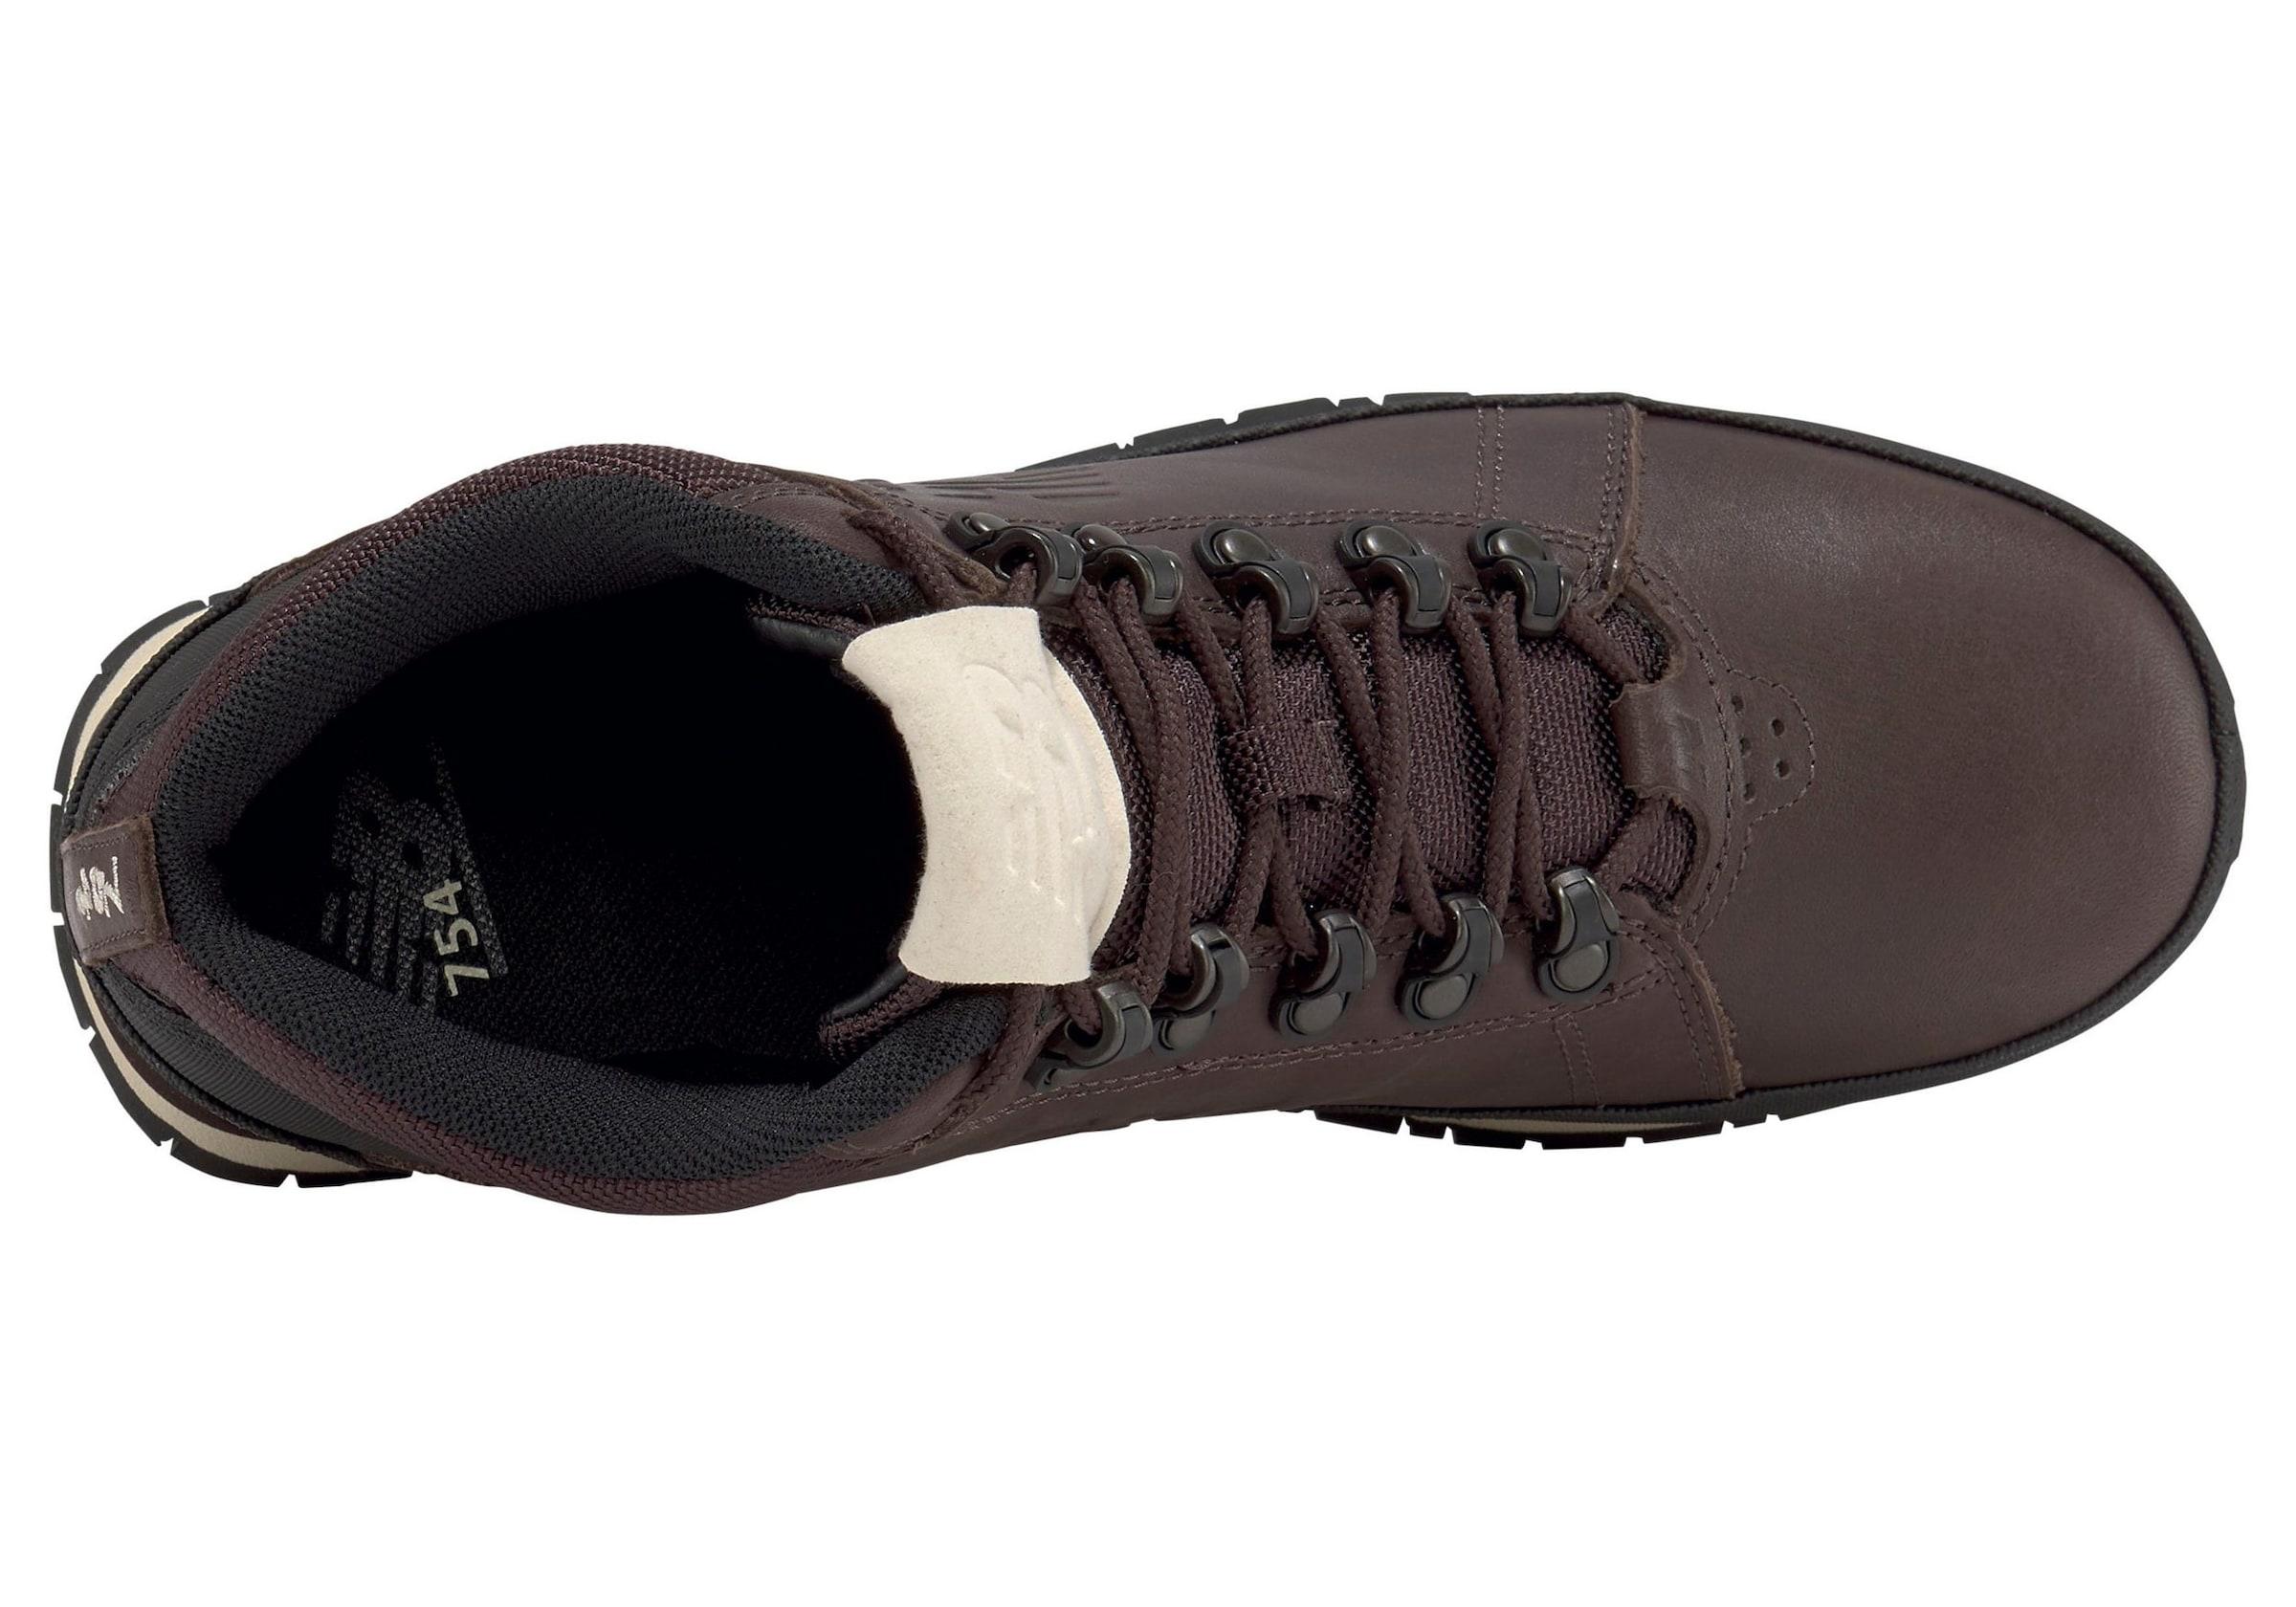 Balance 754' Braun Sneaker New 'h In 8wnPOk0X